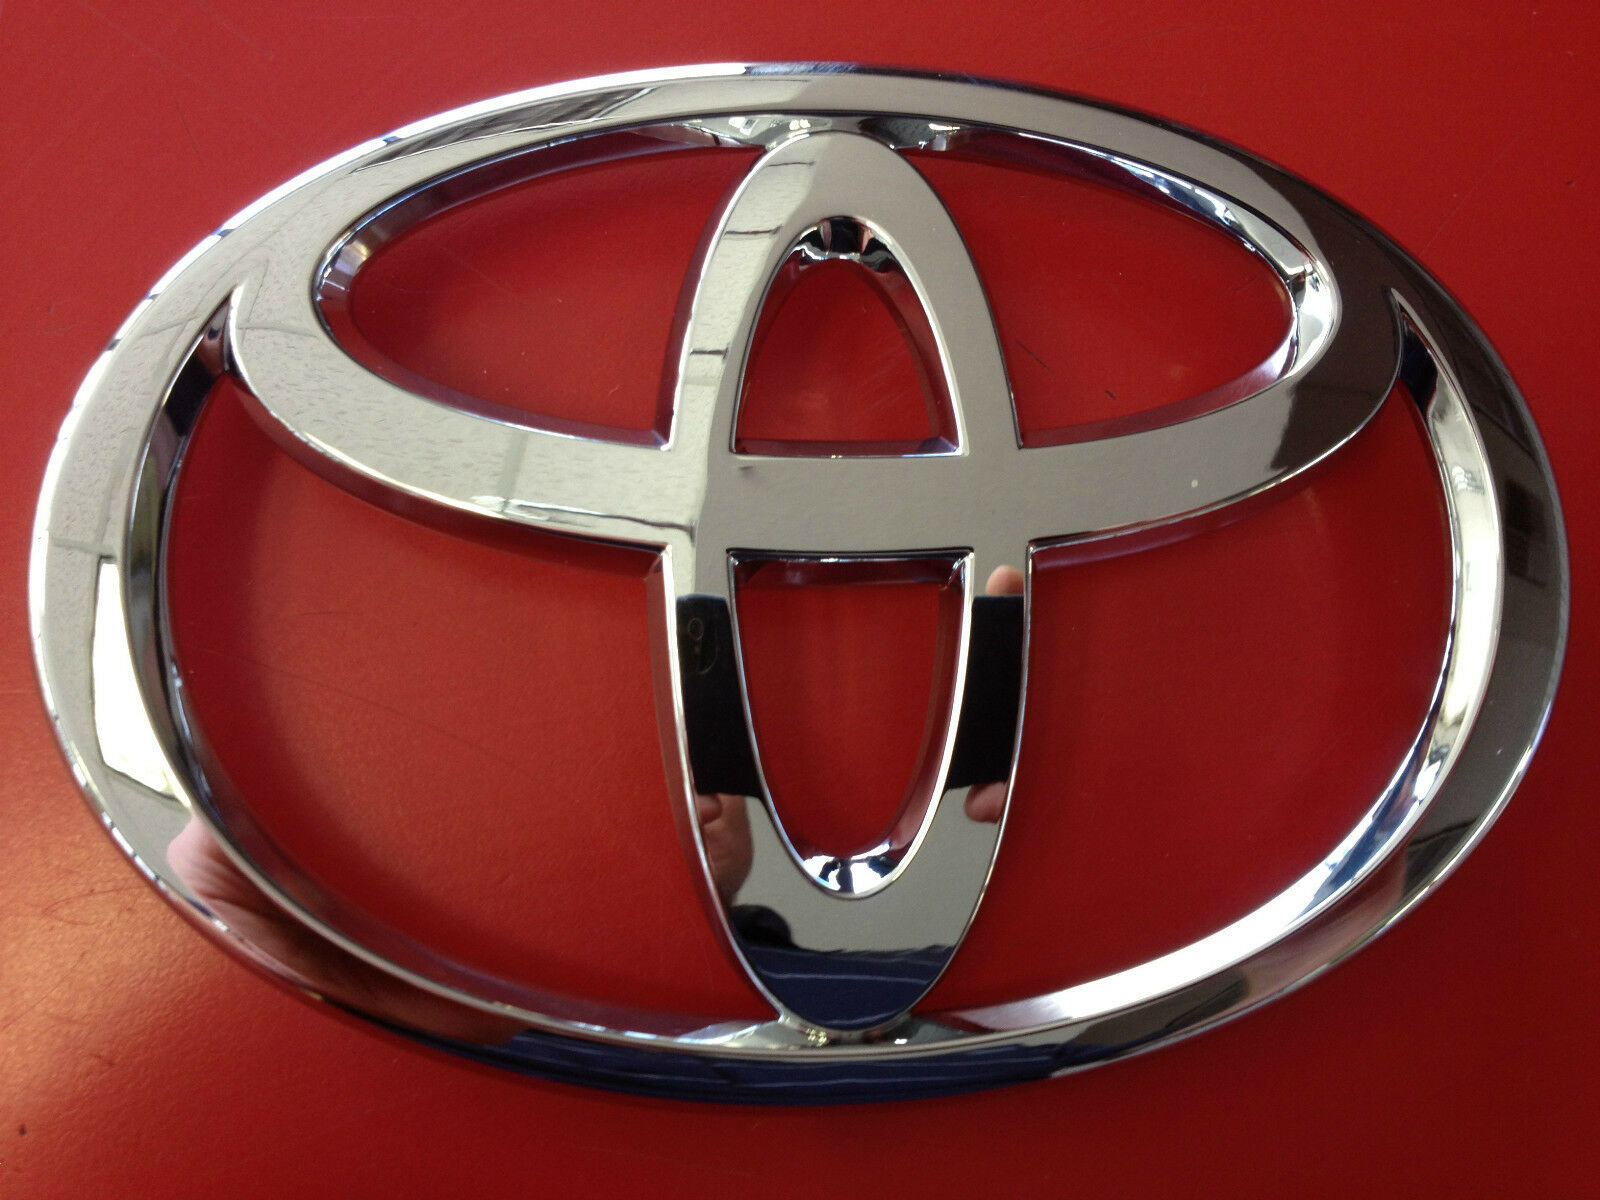 Toyota 4runner und Pickup Truck Kühlergrill Emblem 1992 93 94 94 94 95 Modelle 75311 86b75d